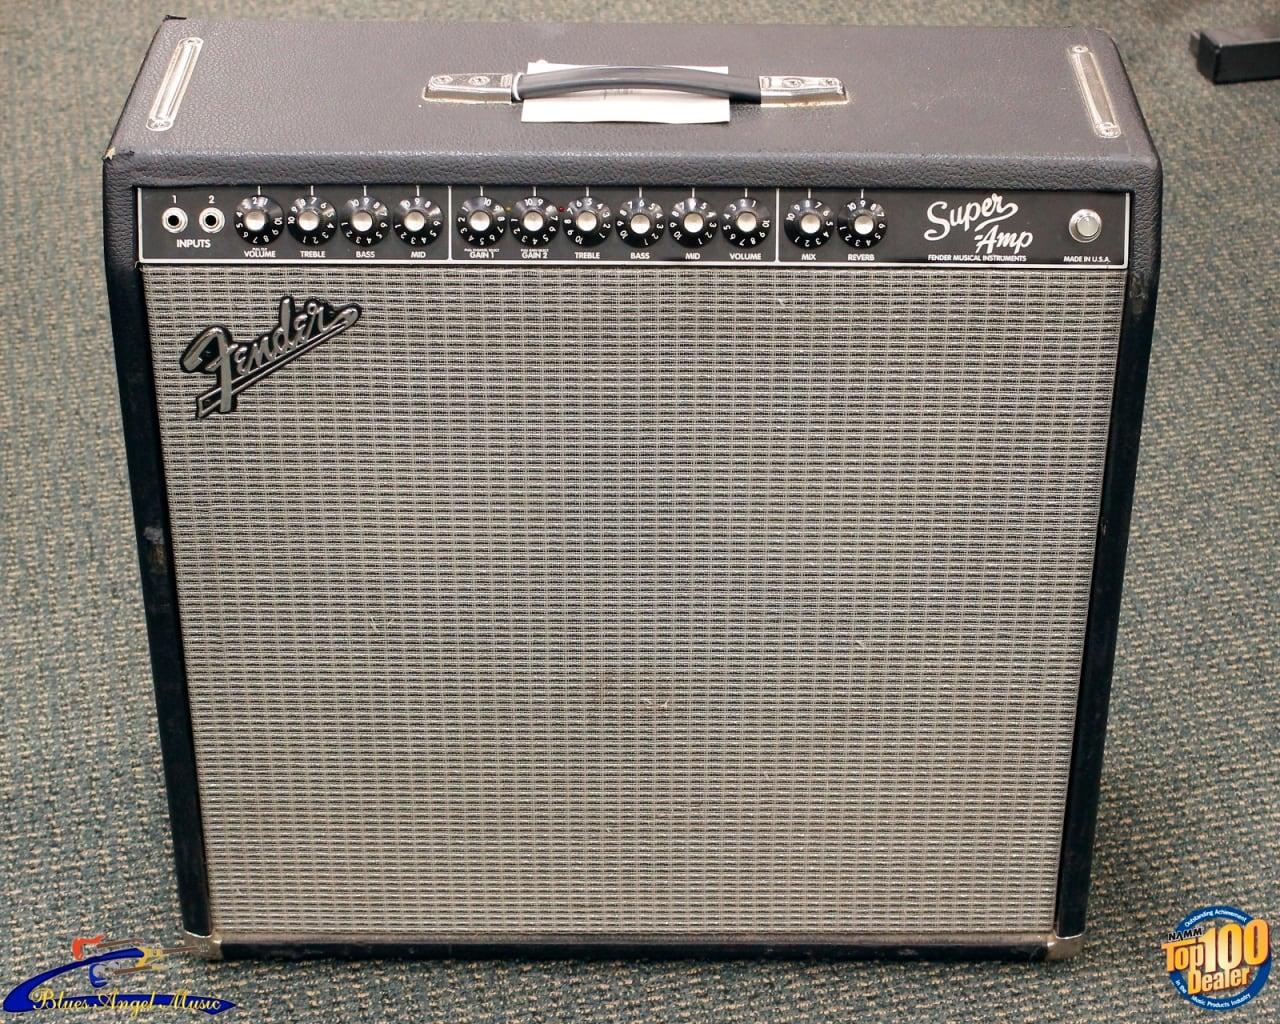 Fender 4x10 Guitar Cabinet 1993 Fender Super Amp 410 Pro Tube Series Guitar Amp Combo Reverb